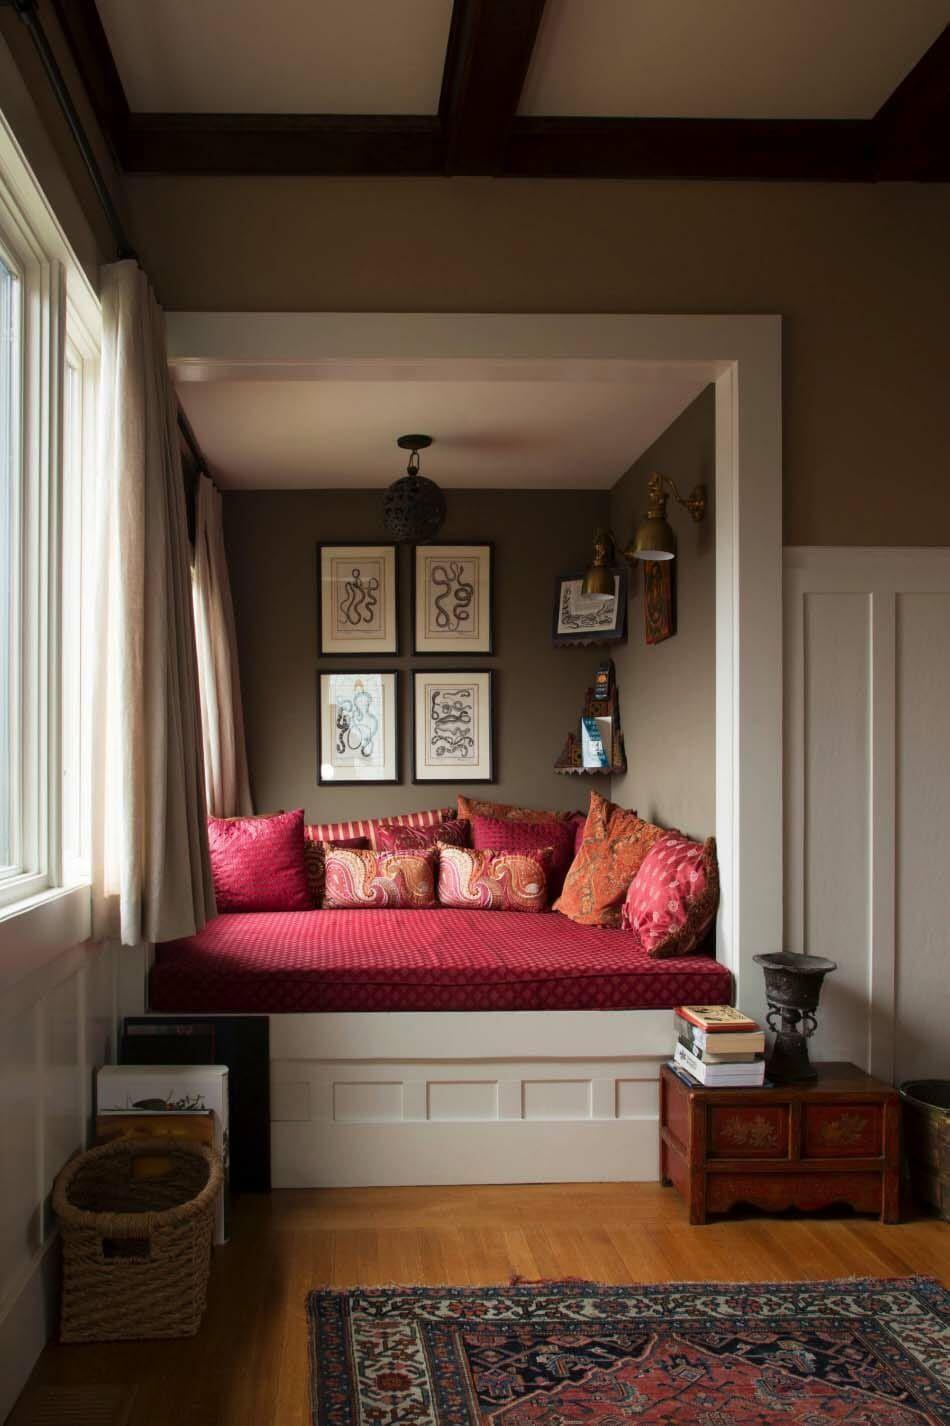 Cozy Romantic Living Room: 20+ Incredibly Cozy Book Nooks